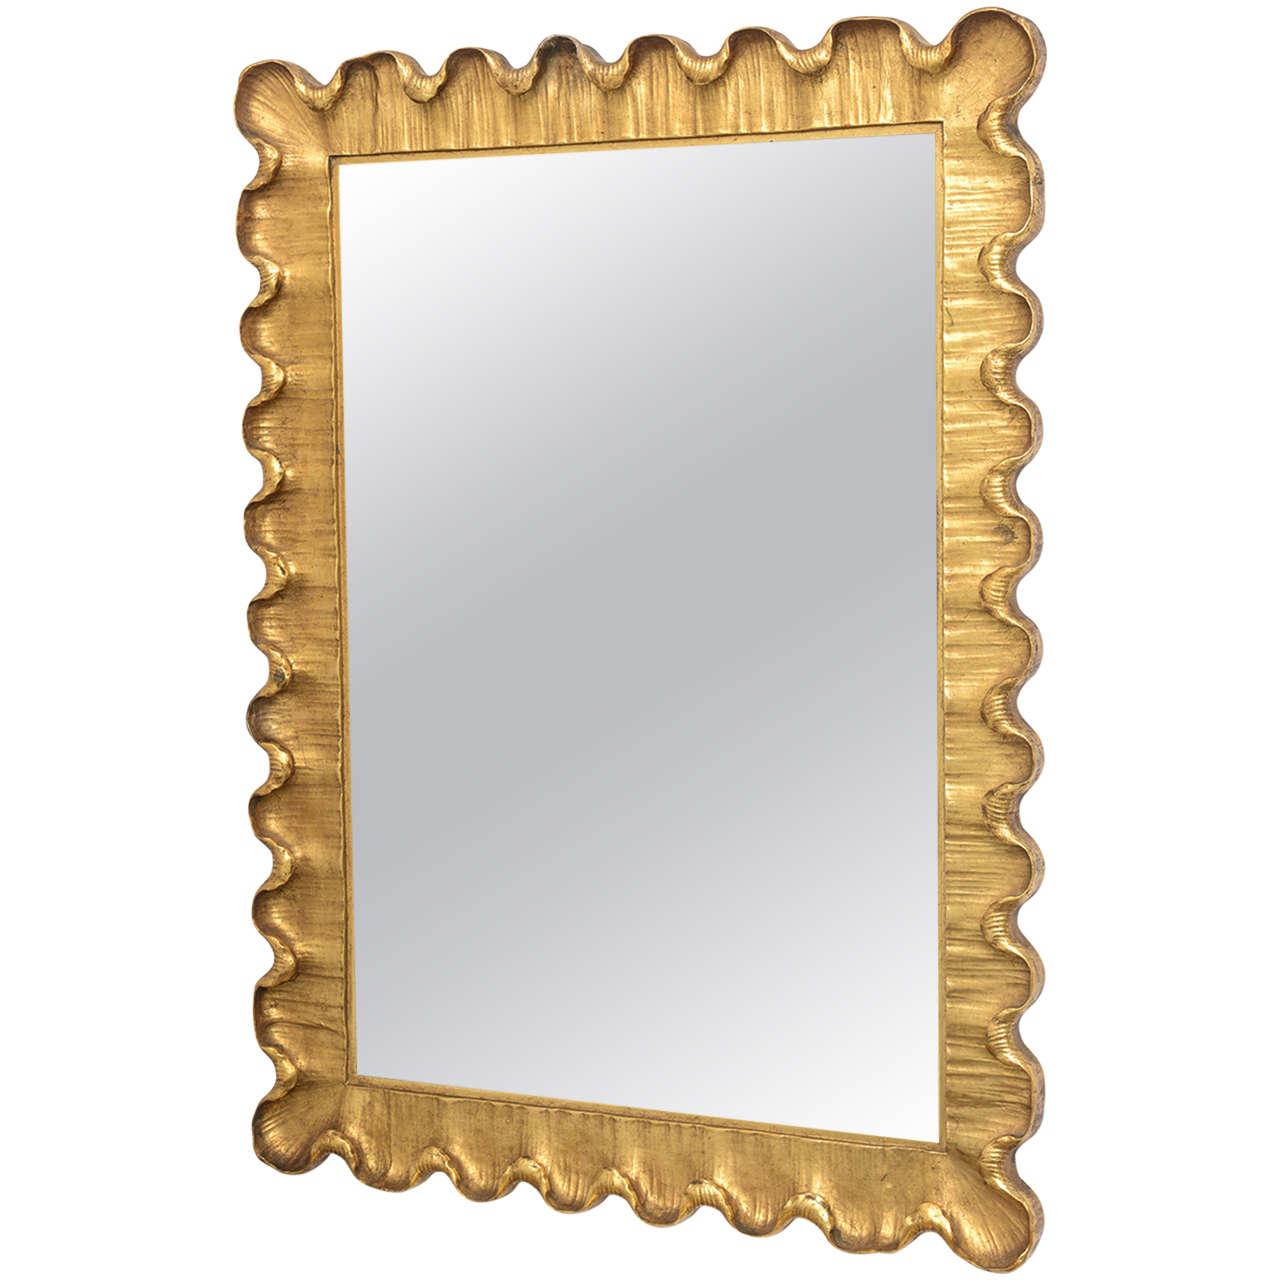 Hollywood regency style mirror gilt wood frame italian for Mirror frame styles